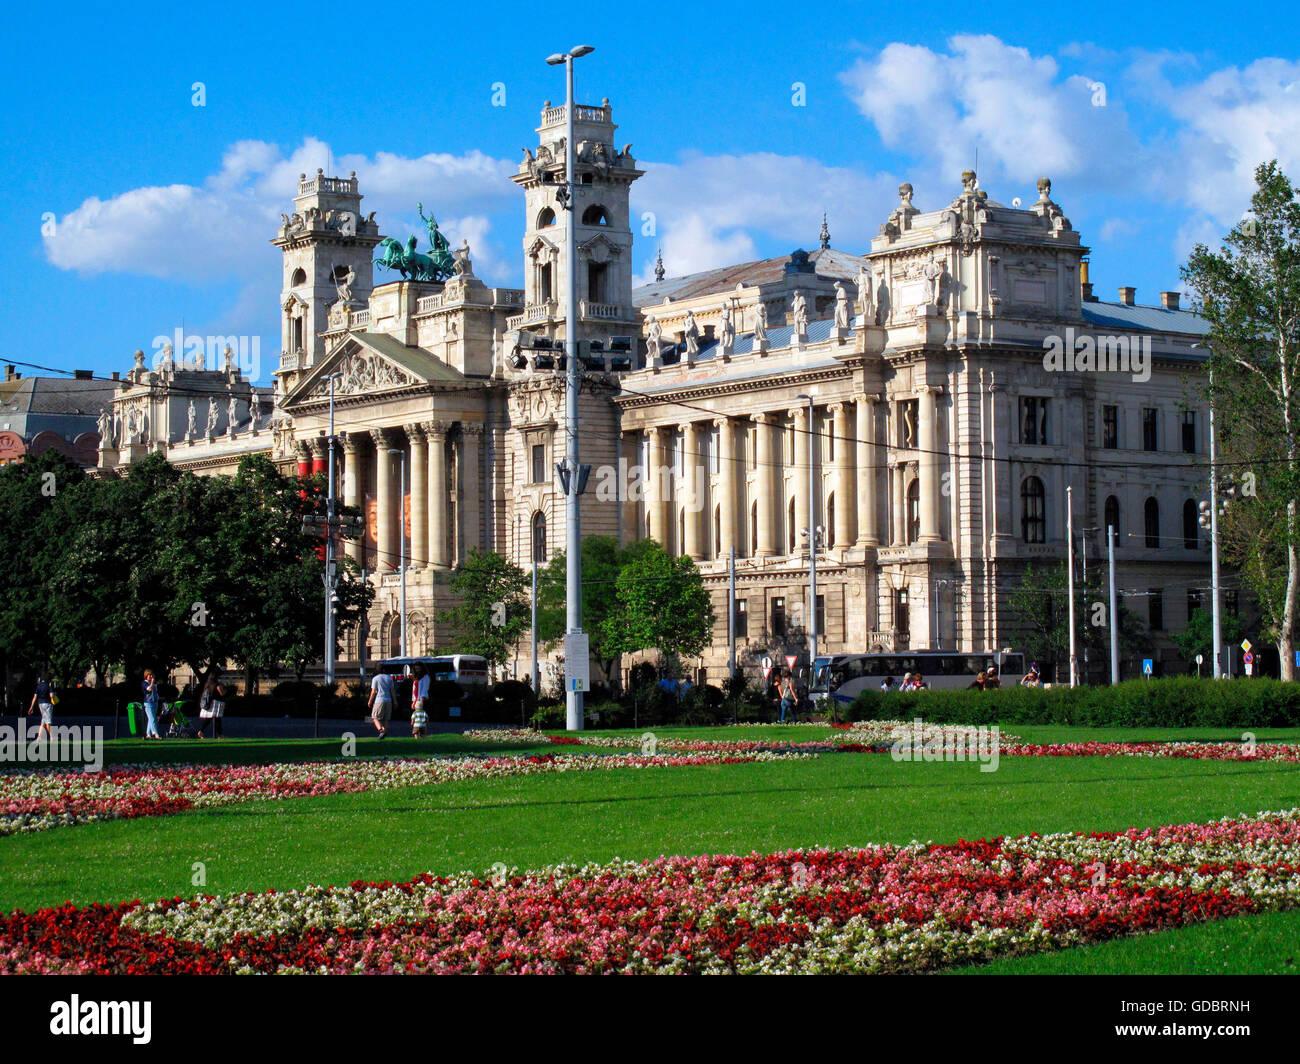 Museum of Ethnography, Budapest, Hungary - Stock Image